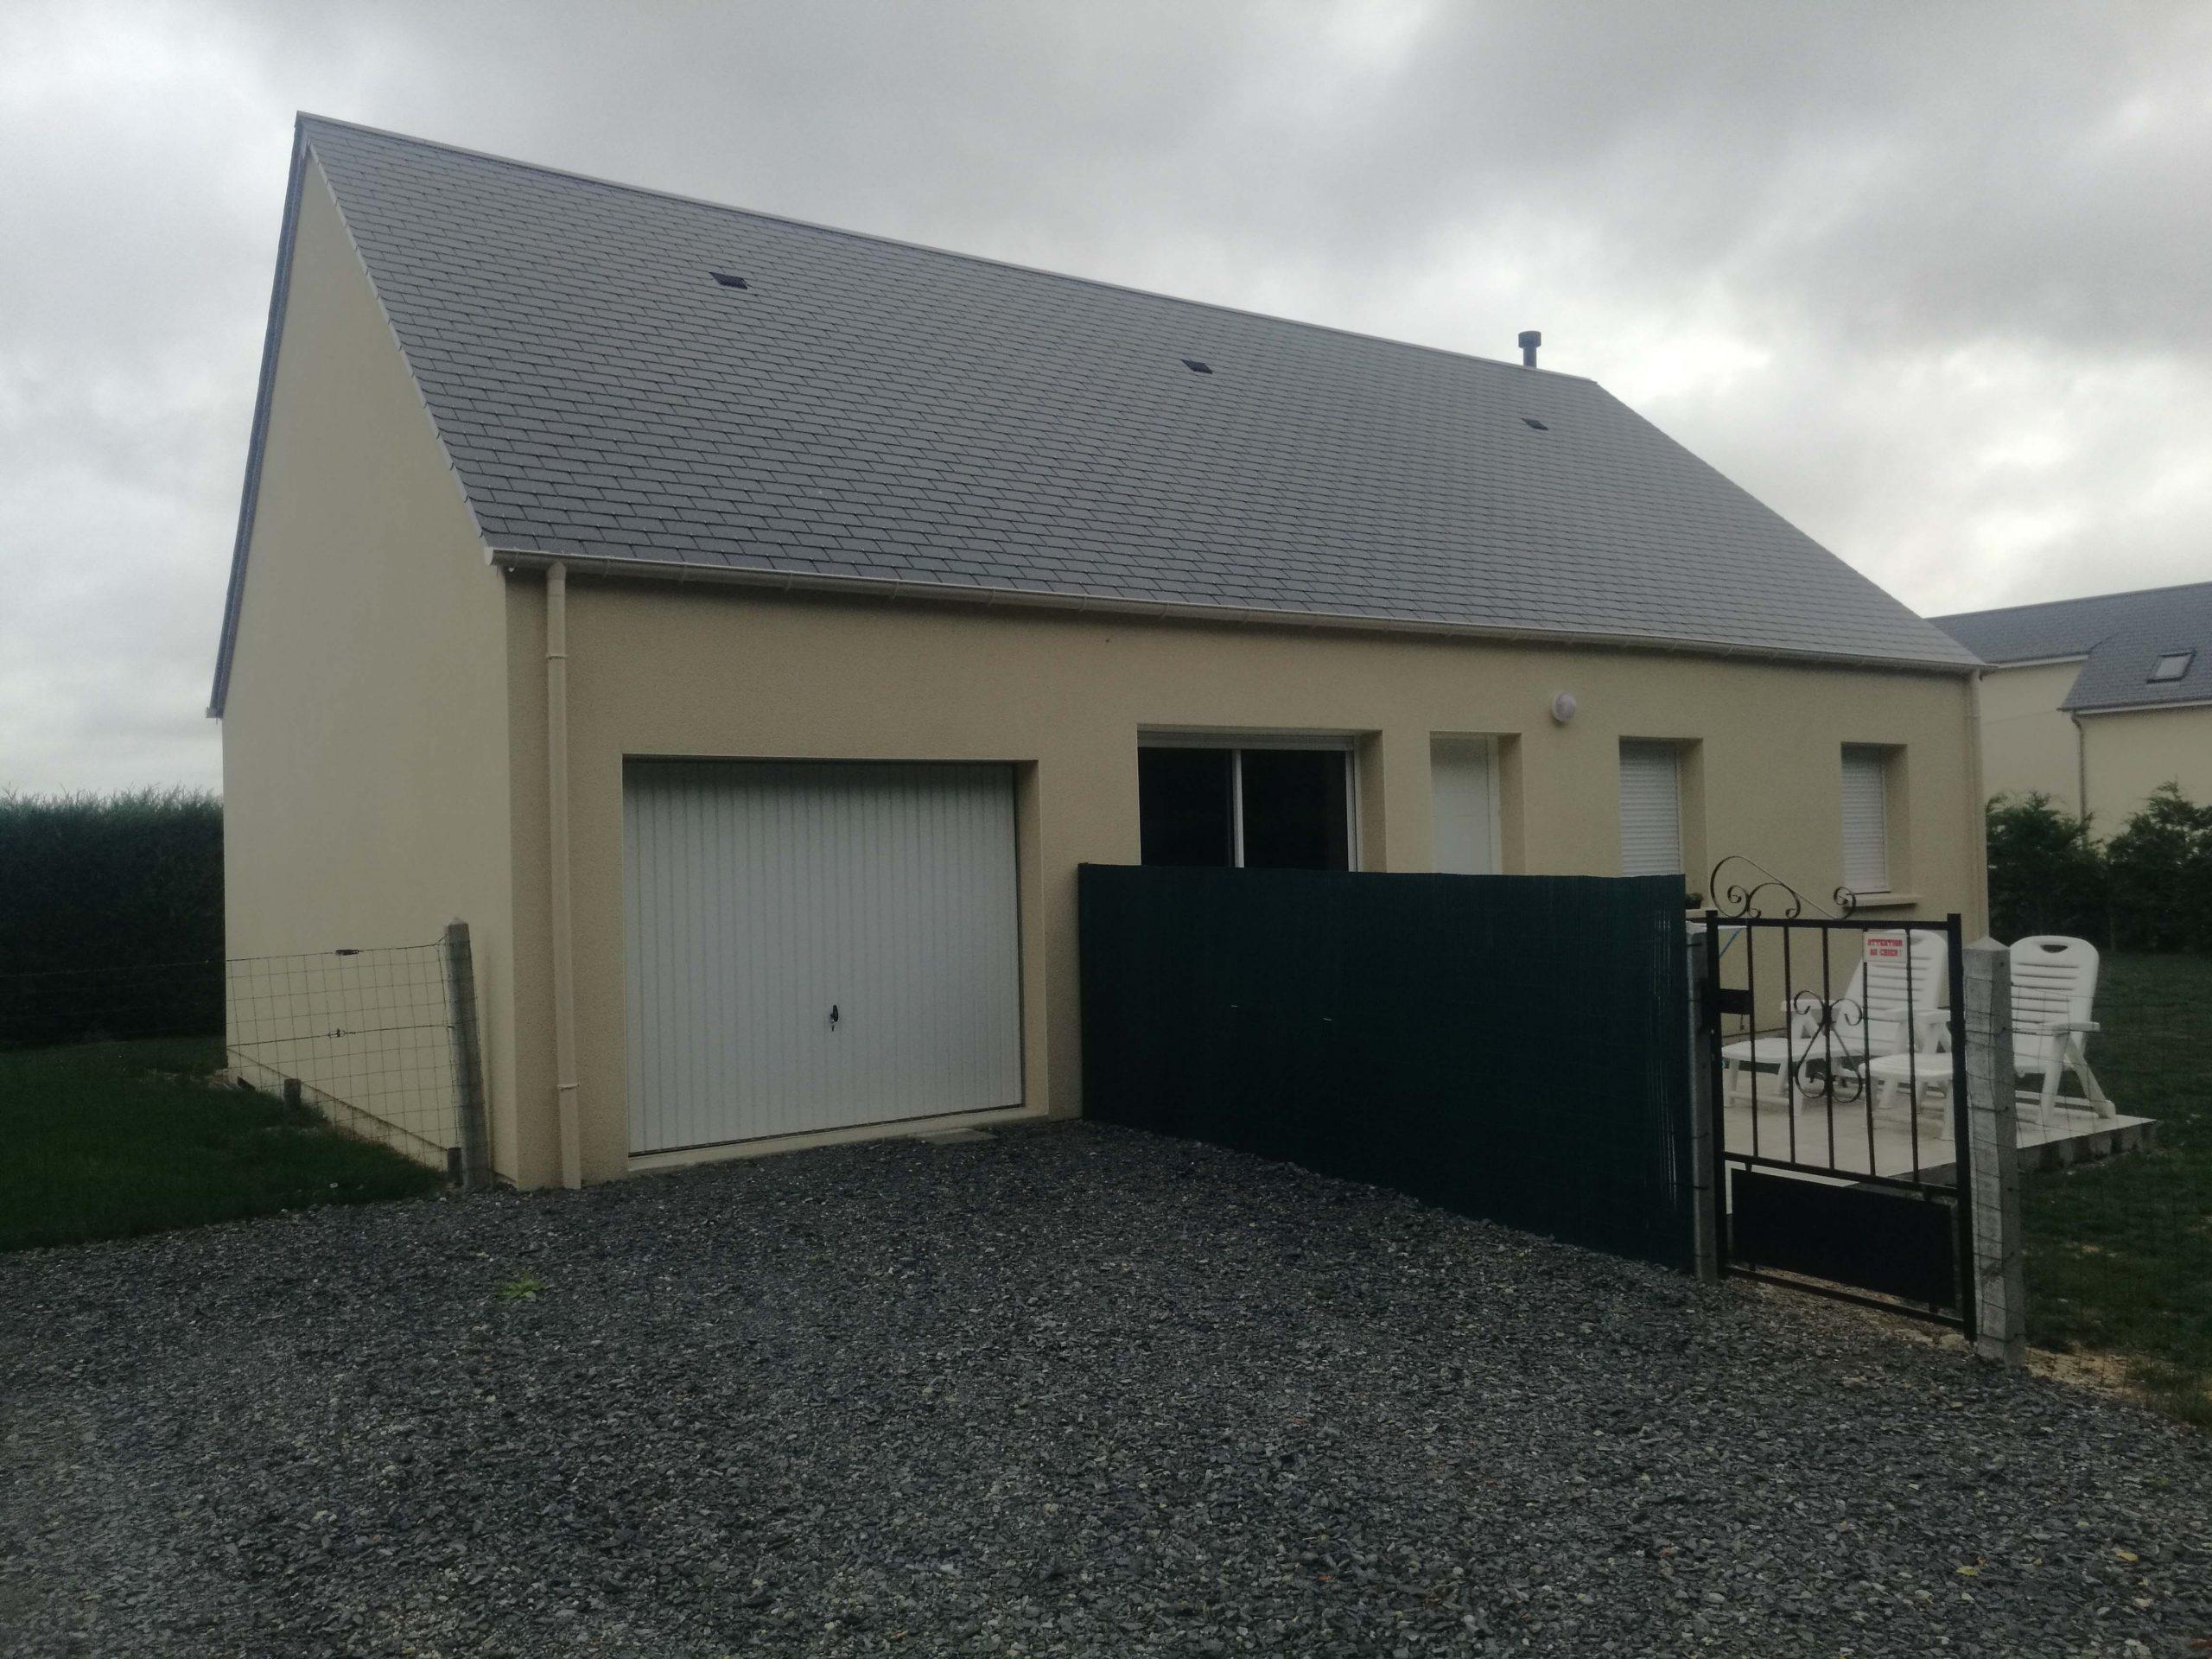 Constructeur maisons individuelles Caen-Jade 80m² avec garage